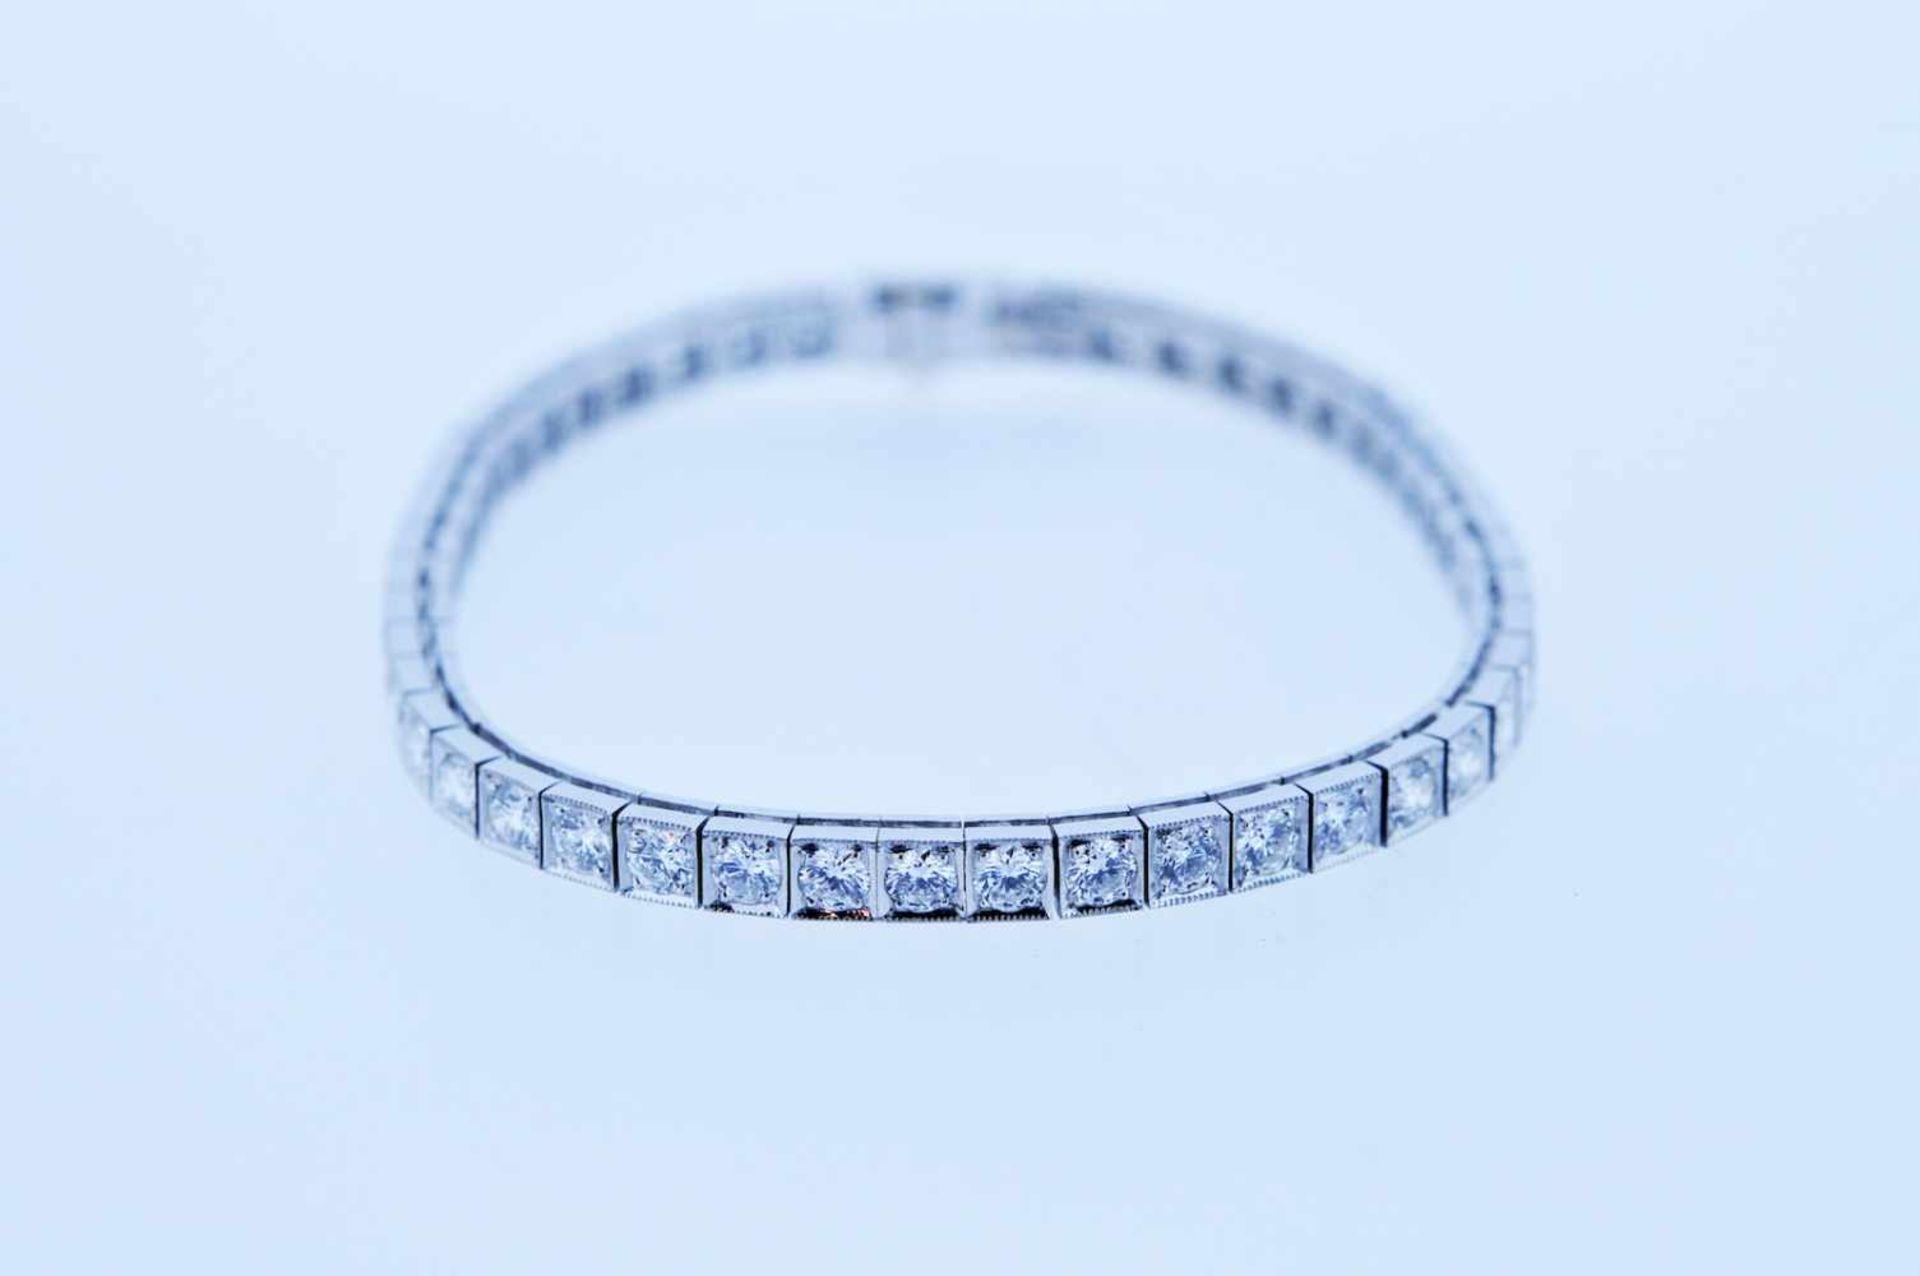 Los 49 - Armband Platin Brillantarmband, zus.ca. 4,8 ct, Länge ca. 17,5 cm, 18,9 g. Bracelet Bracelet with